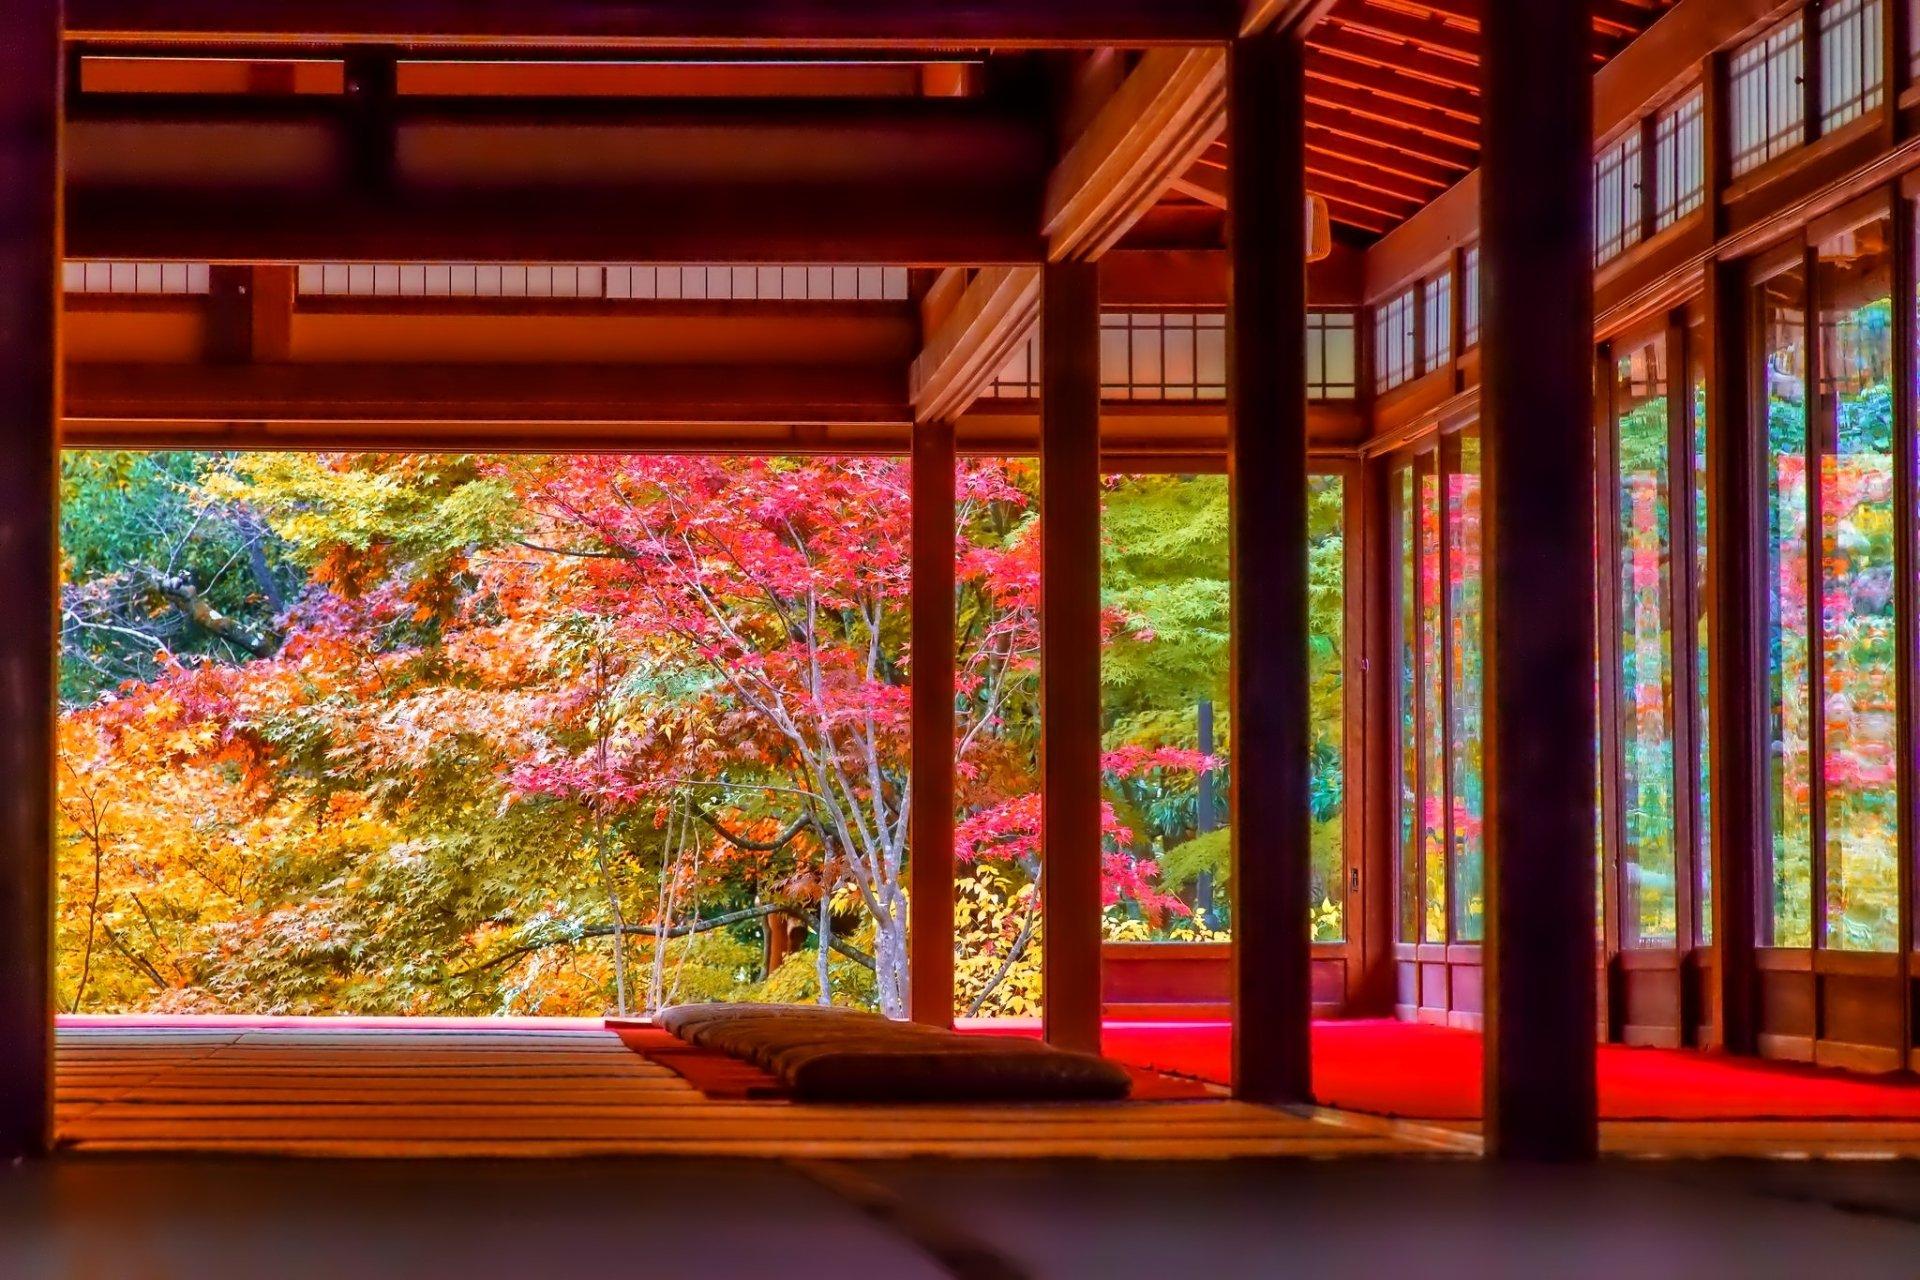 French Fall Wallpaper Japanese House In Autumn Fond D 233 Cran Hd Arri 232 Re Plan